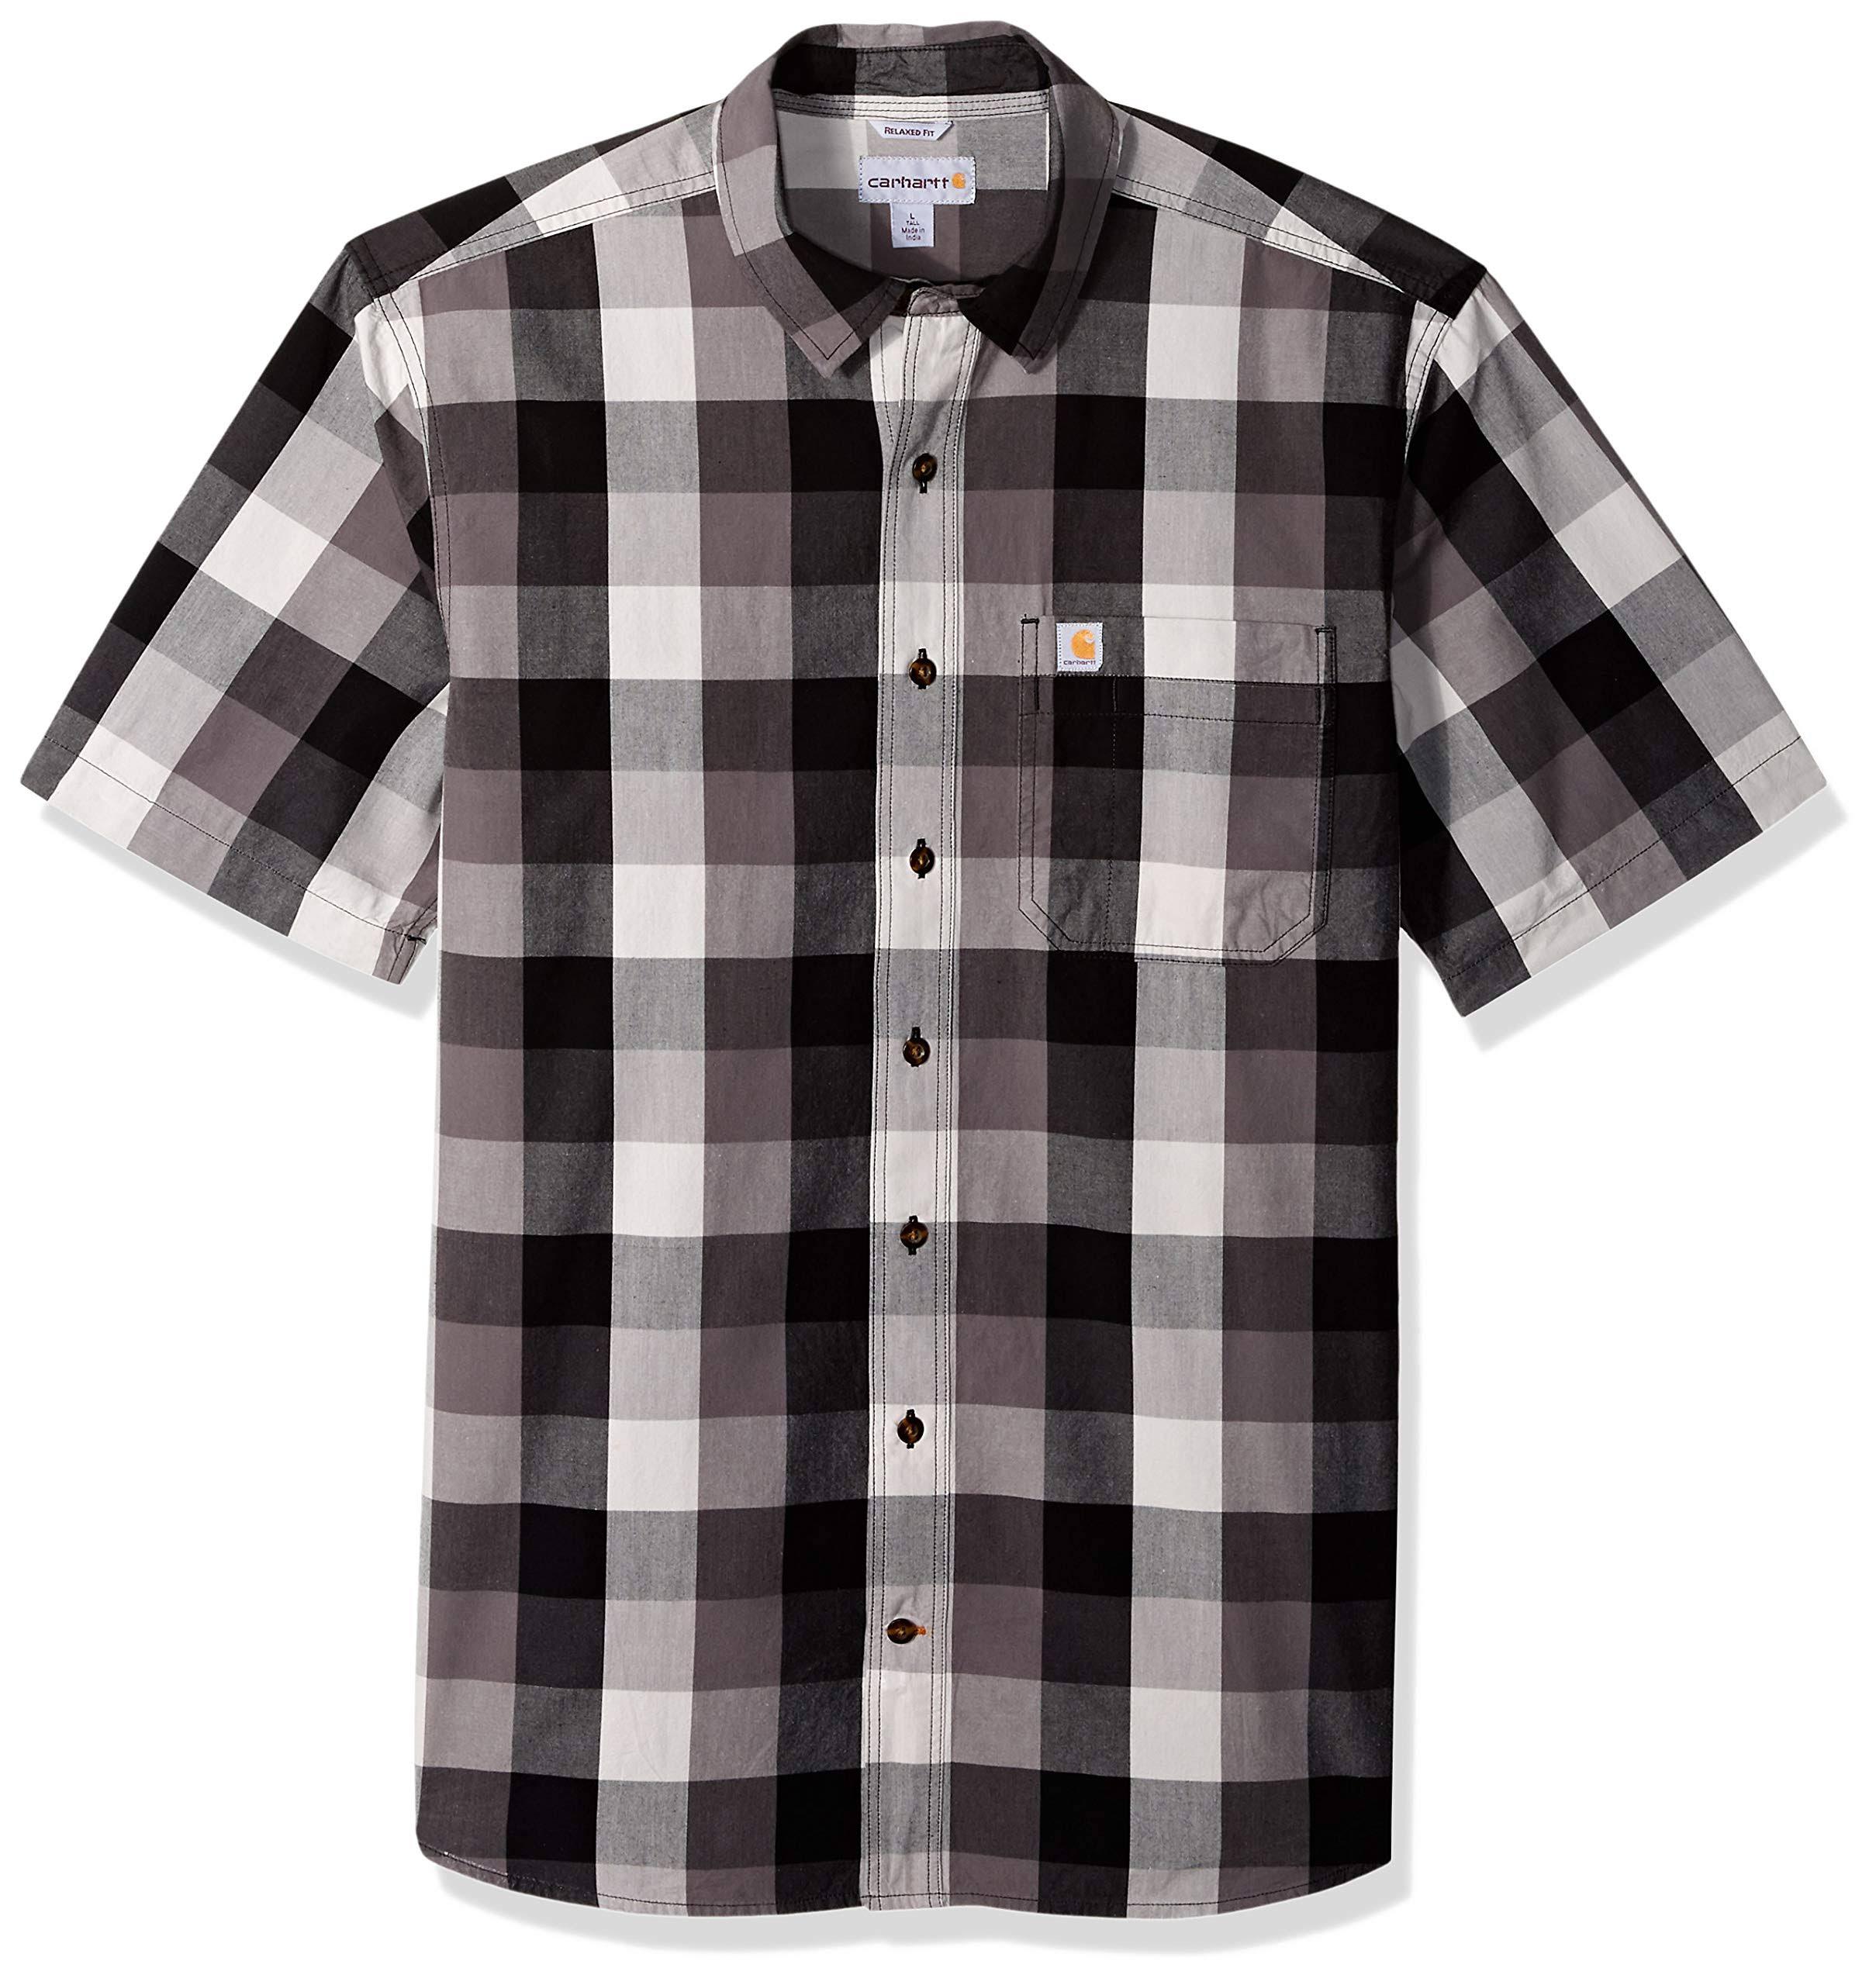 Carhartt De Hombre Regular Manga Essential Con Para Plaid Camisa Corta Cuello Abierto 8dxqw8vPB